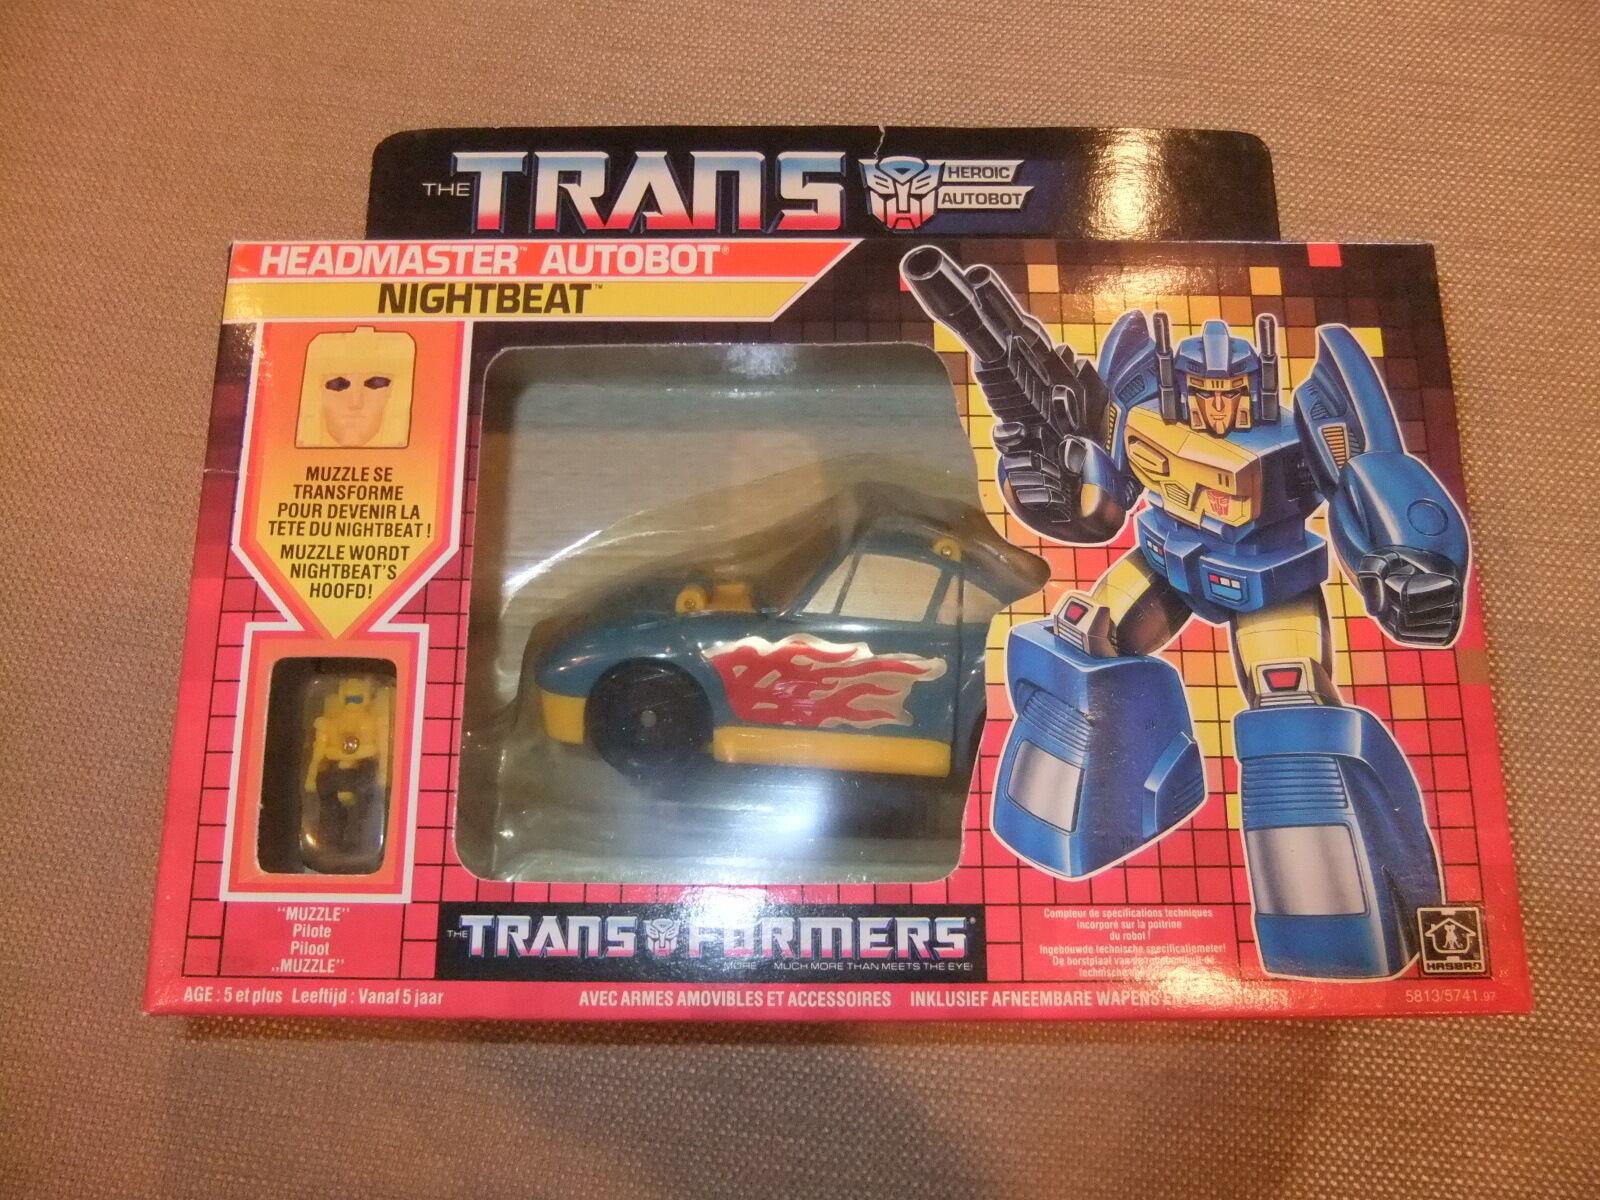 Transformers 1987 1987 1987 Generation 1 Headmaster Autobot Nightbeat+Muzzle Pilote MISB f2d723